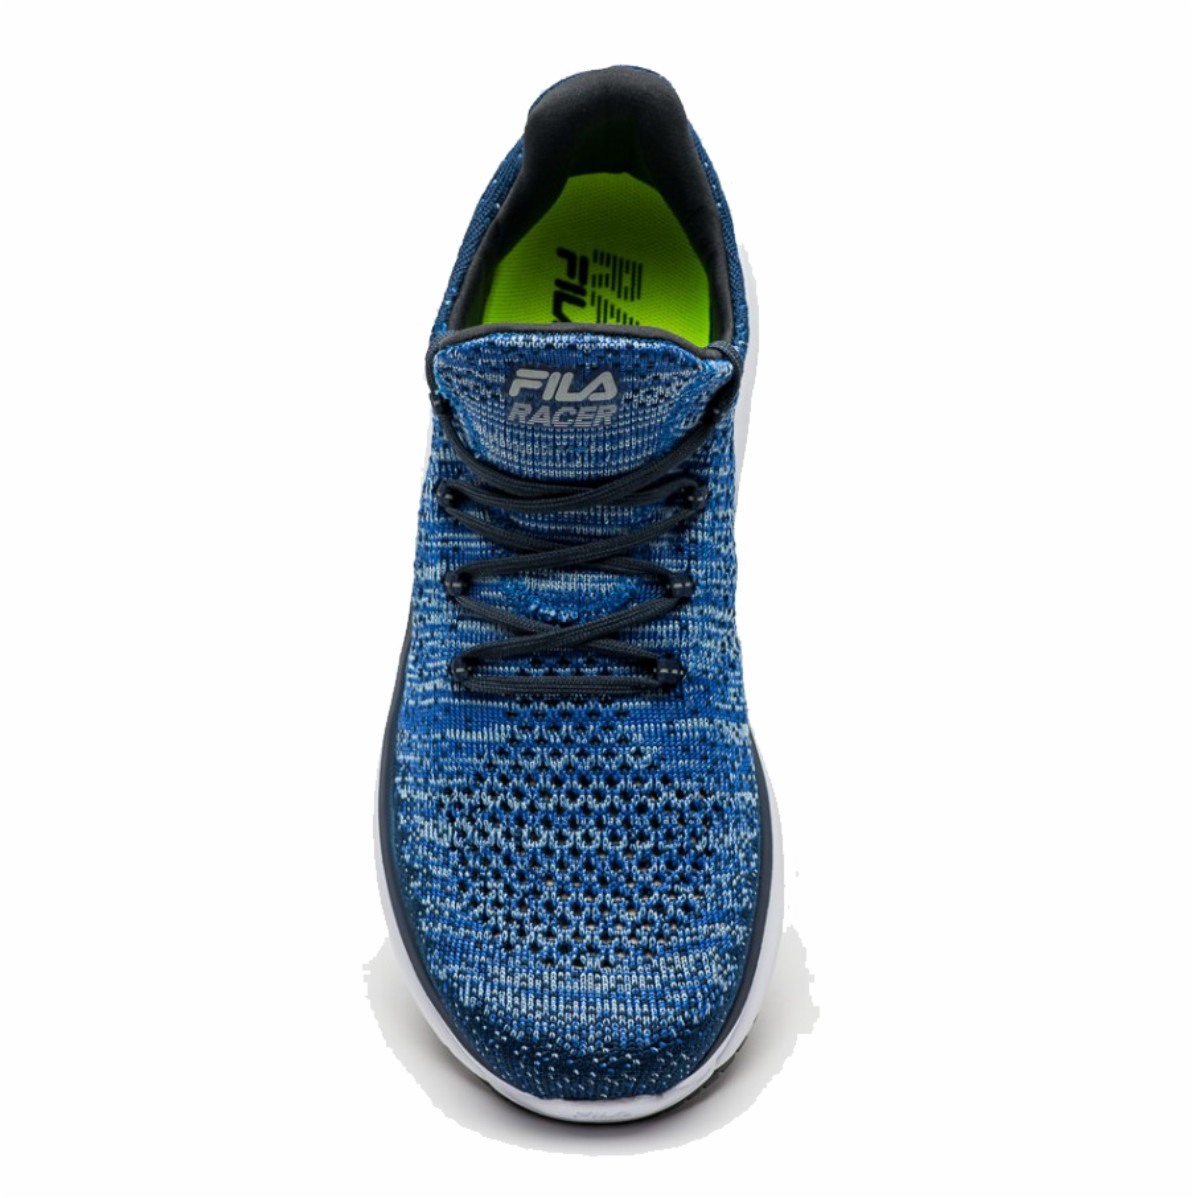 Tenis Fila Racer Knit Energized Masculino Running Training Marinho